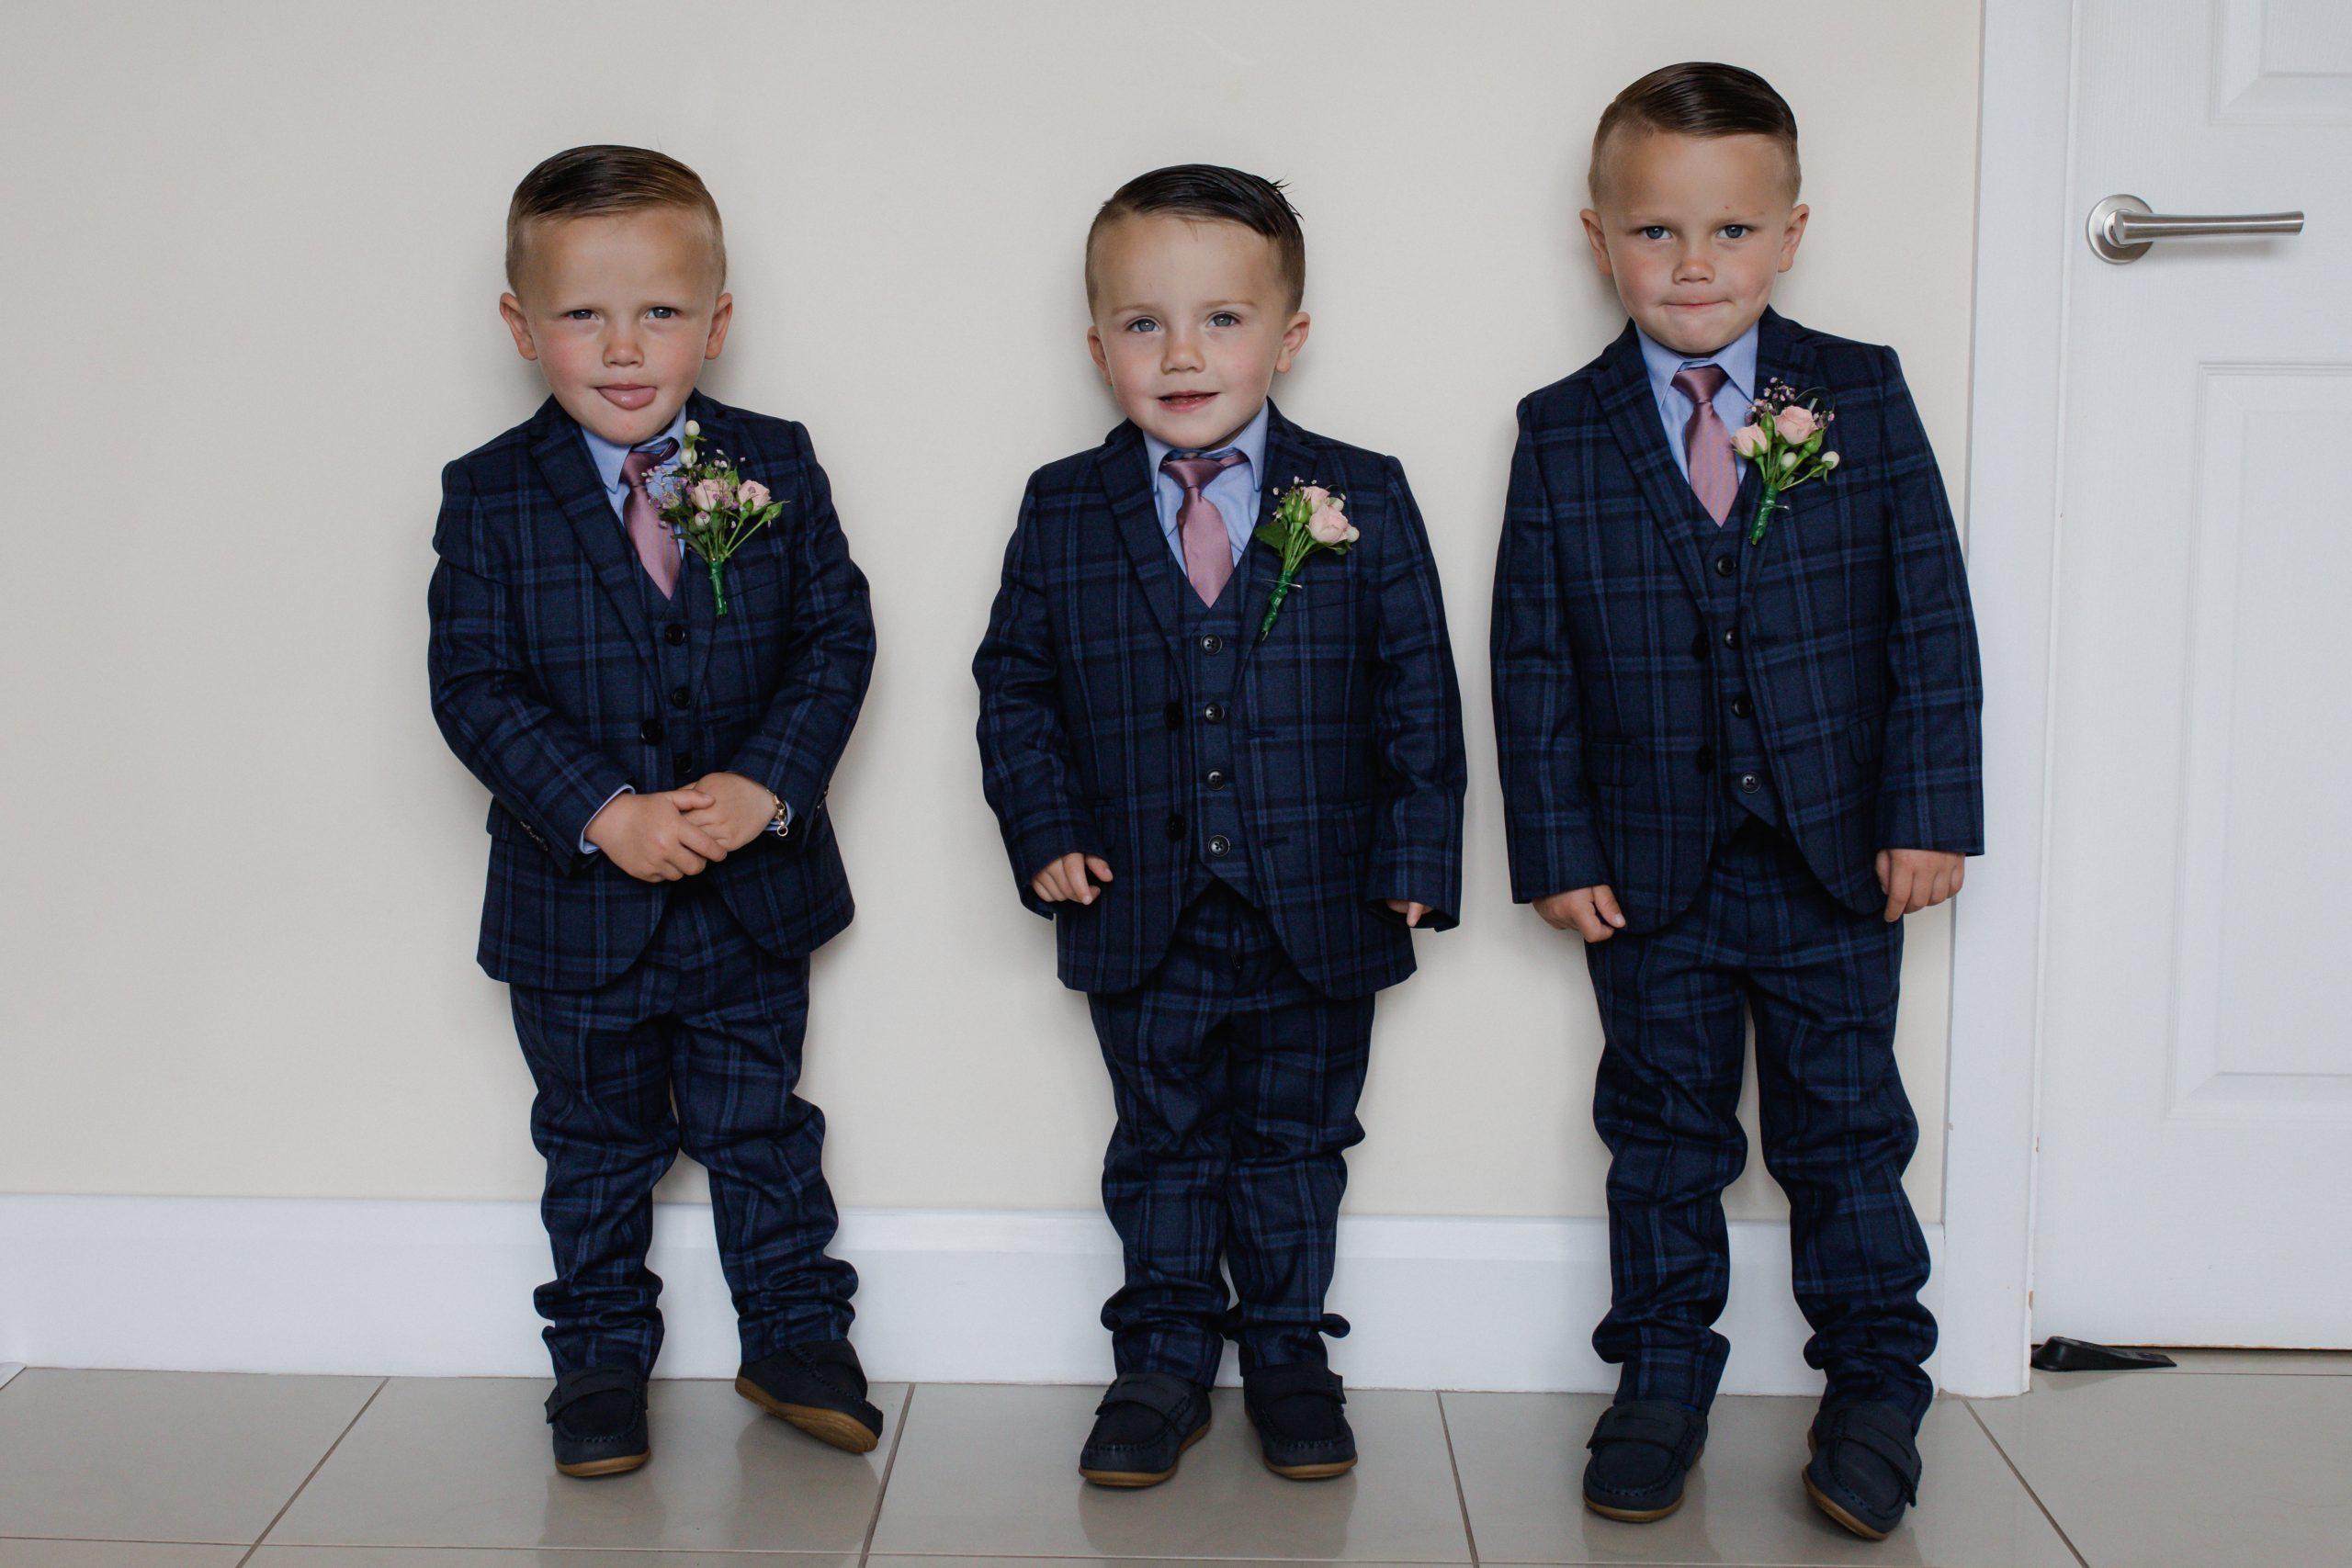 Chelsea & Harry Wedding Page Boys Emma Lowe Wedding Photography